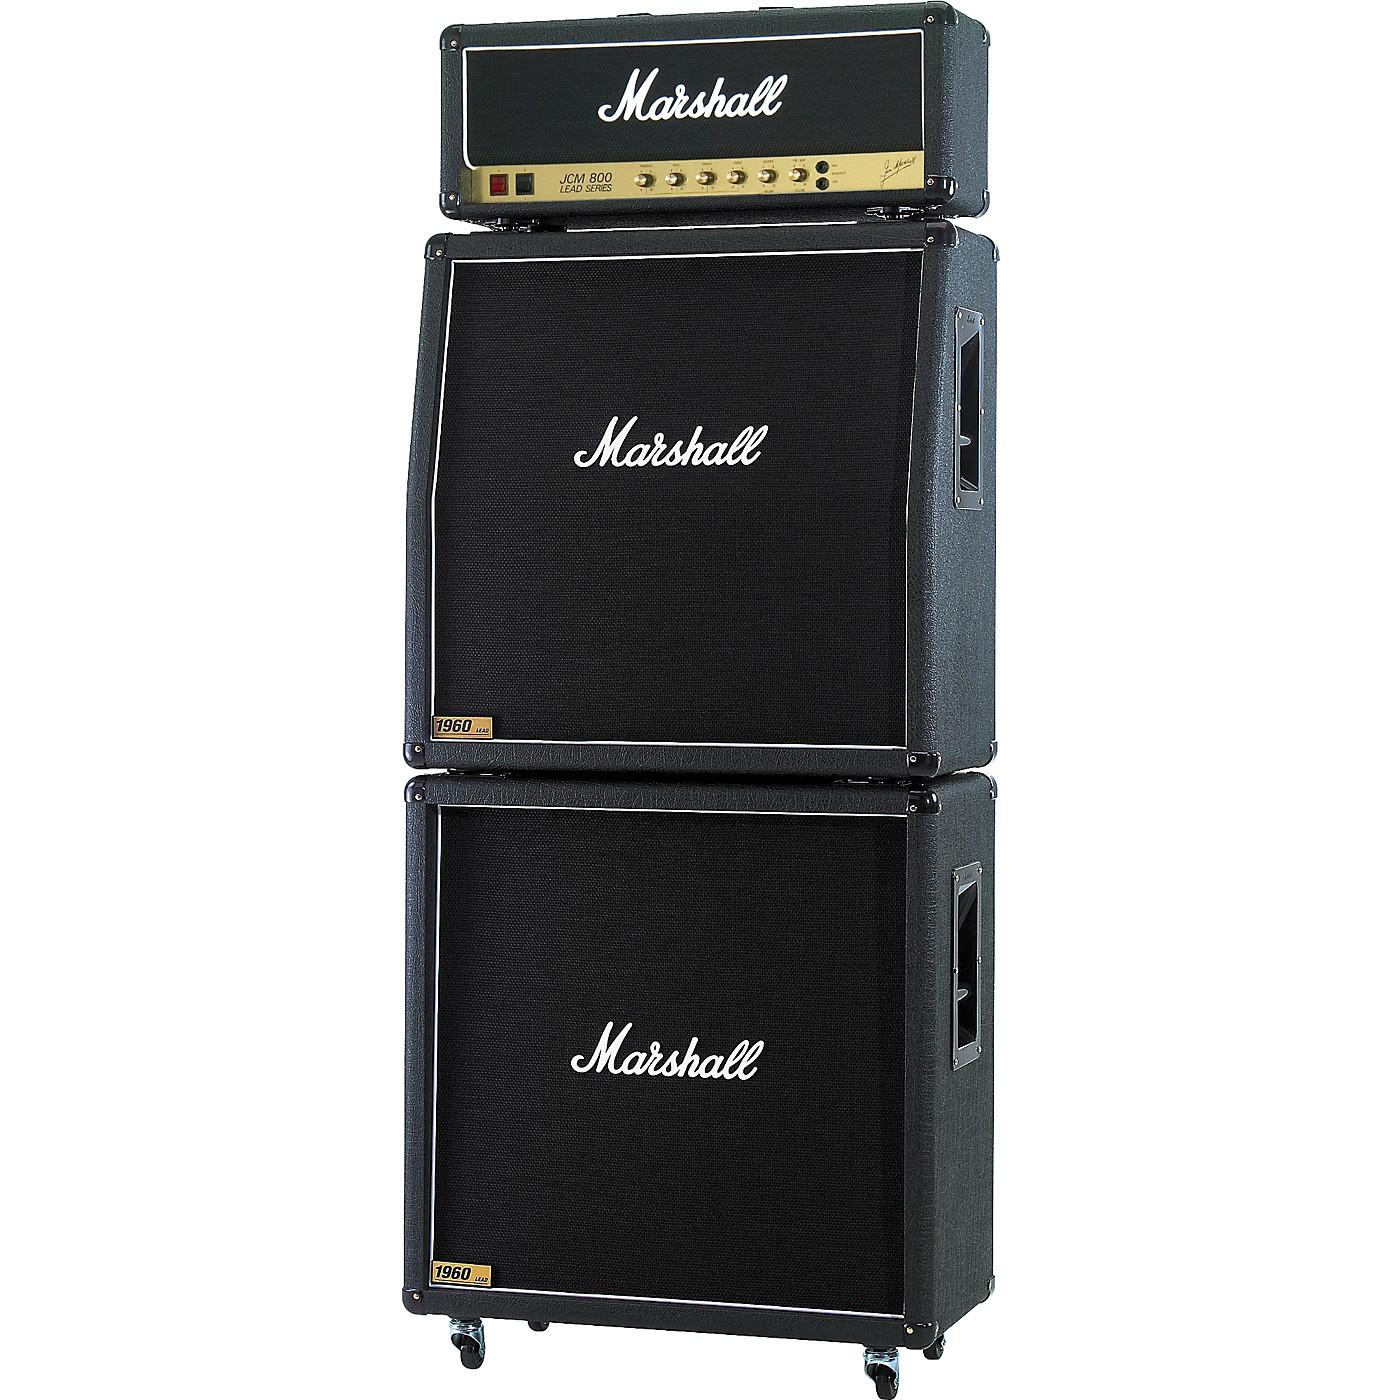 Marshall JCM800 2203X, 1960A, and 1960B Tube Guitar Full Stack thumbnail